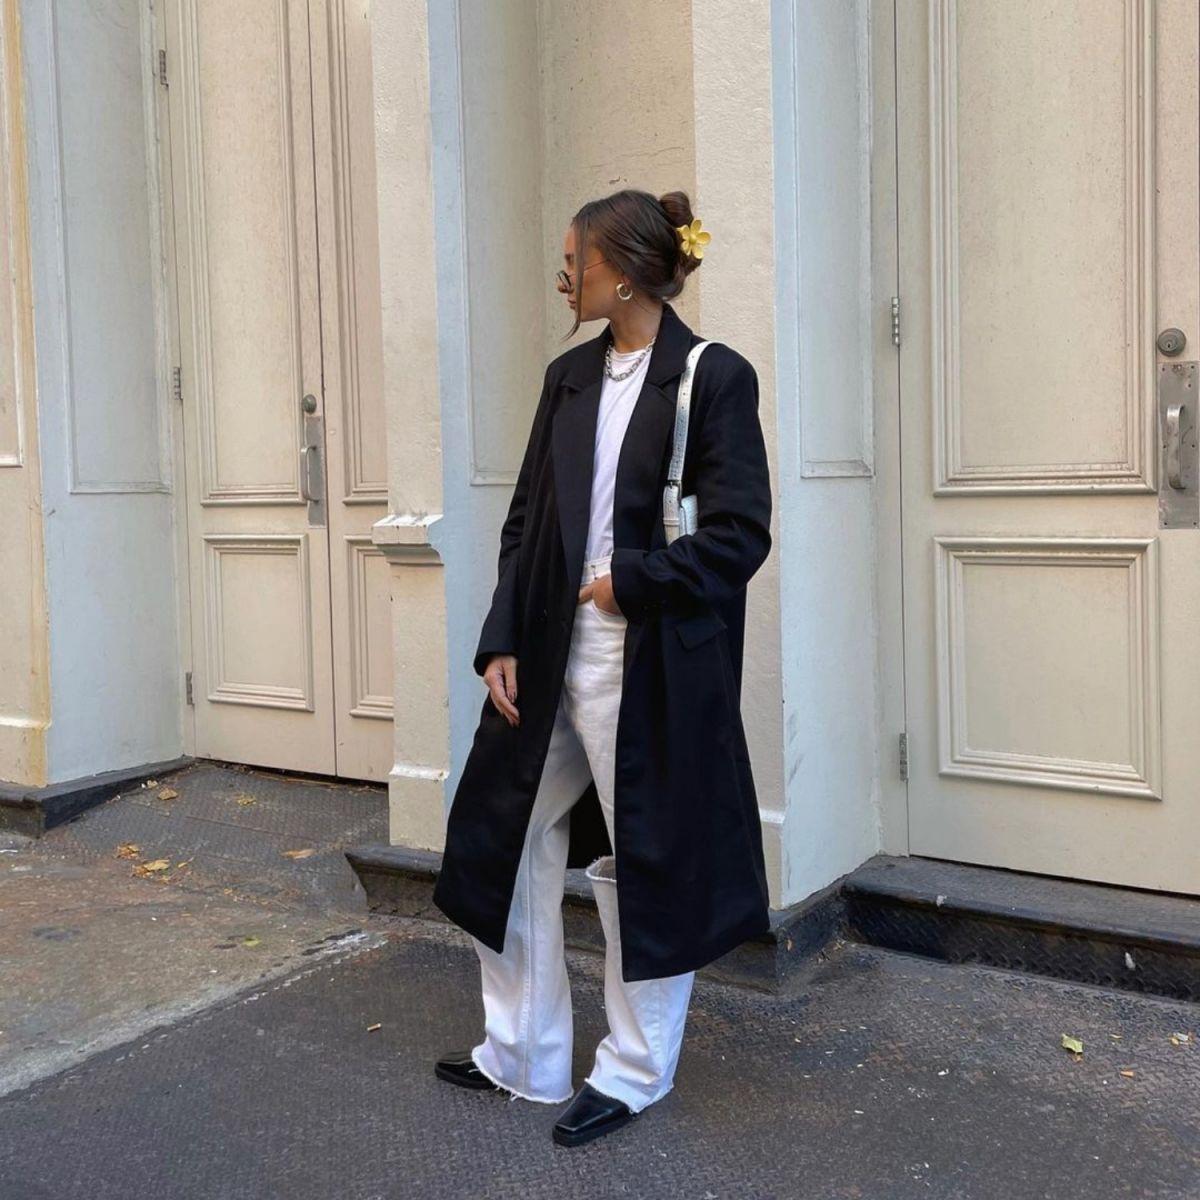 Casual & Chic στην πόλη: 5 looks που πρέπει να δοκιμάσεις!